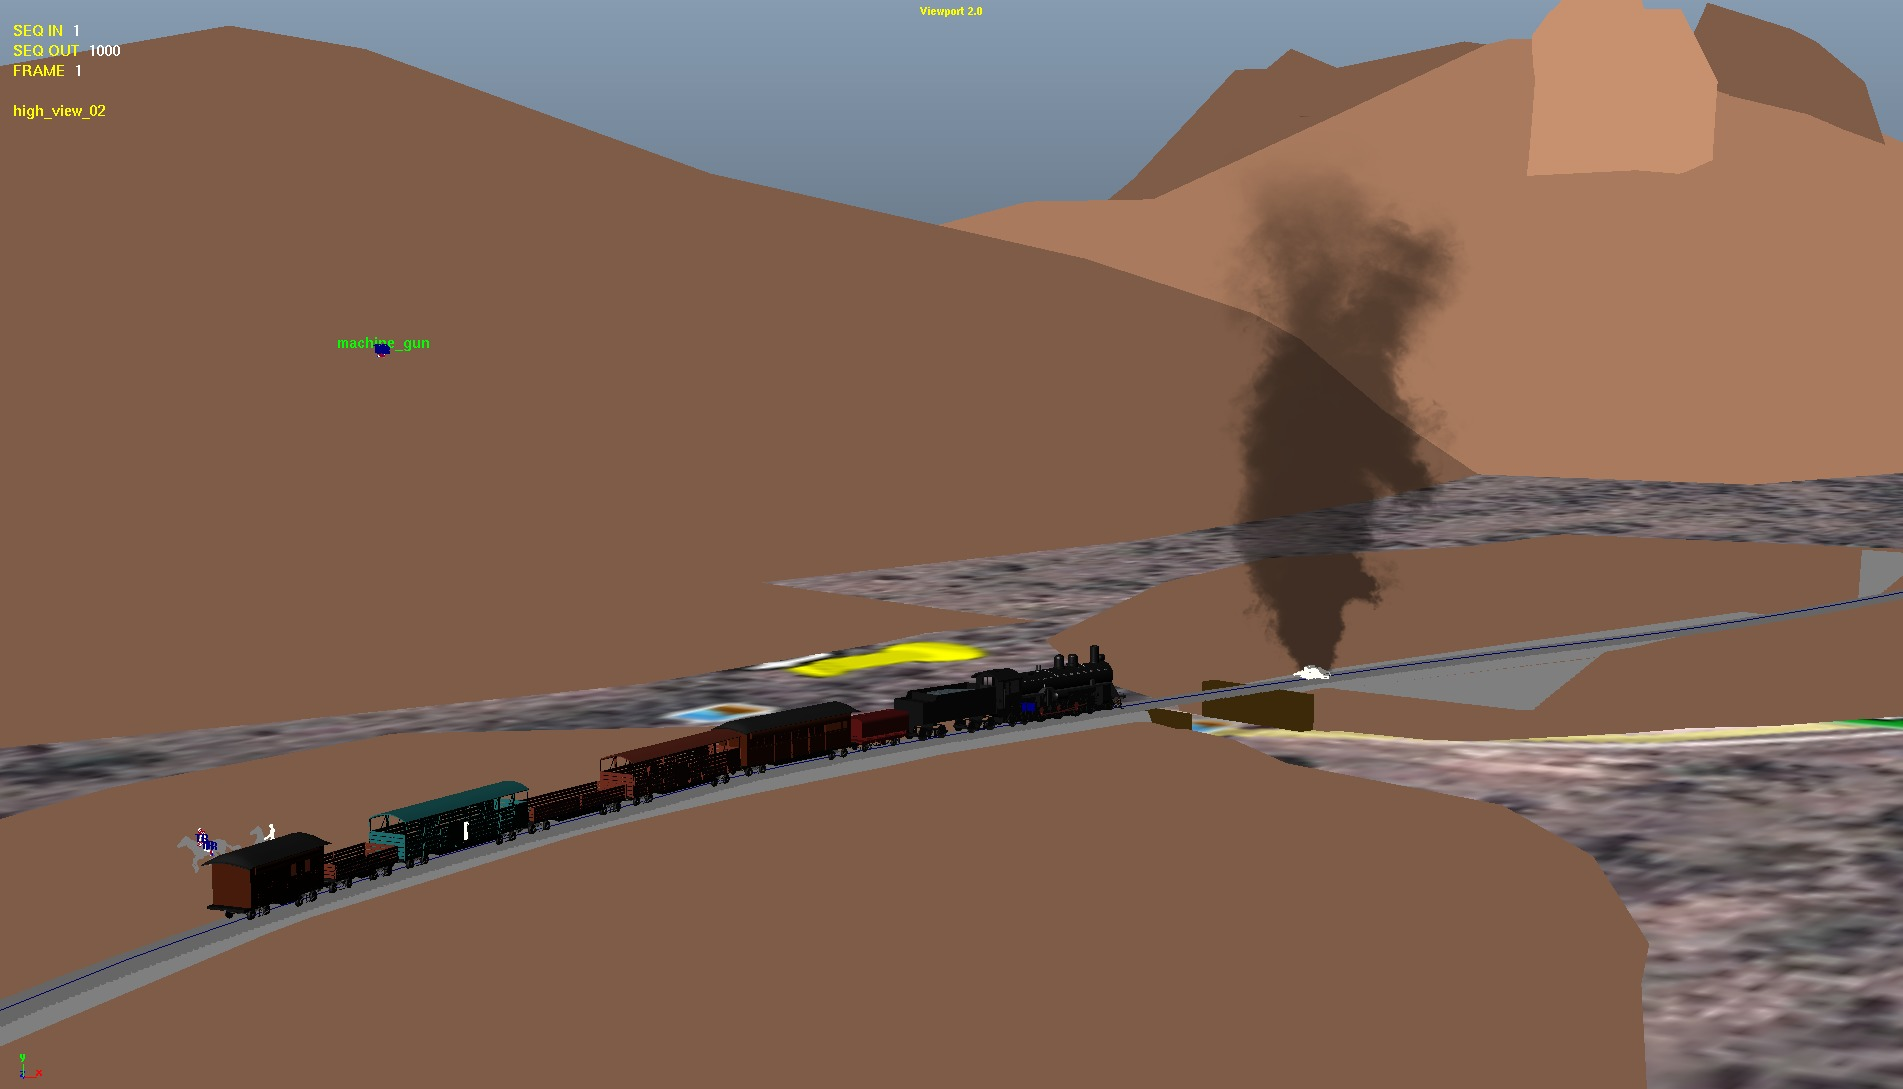 trainseq-2.jpg